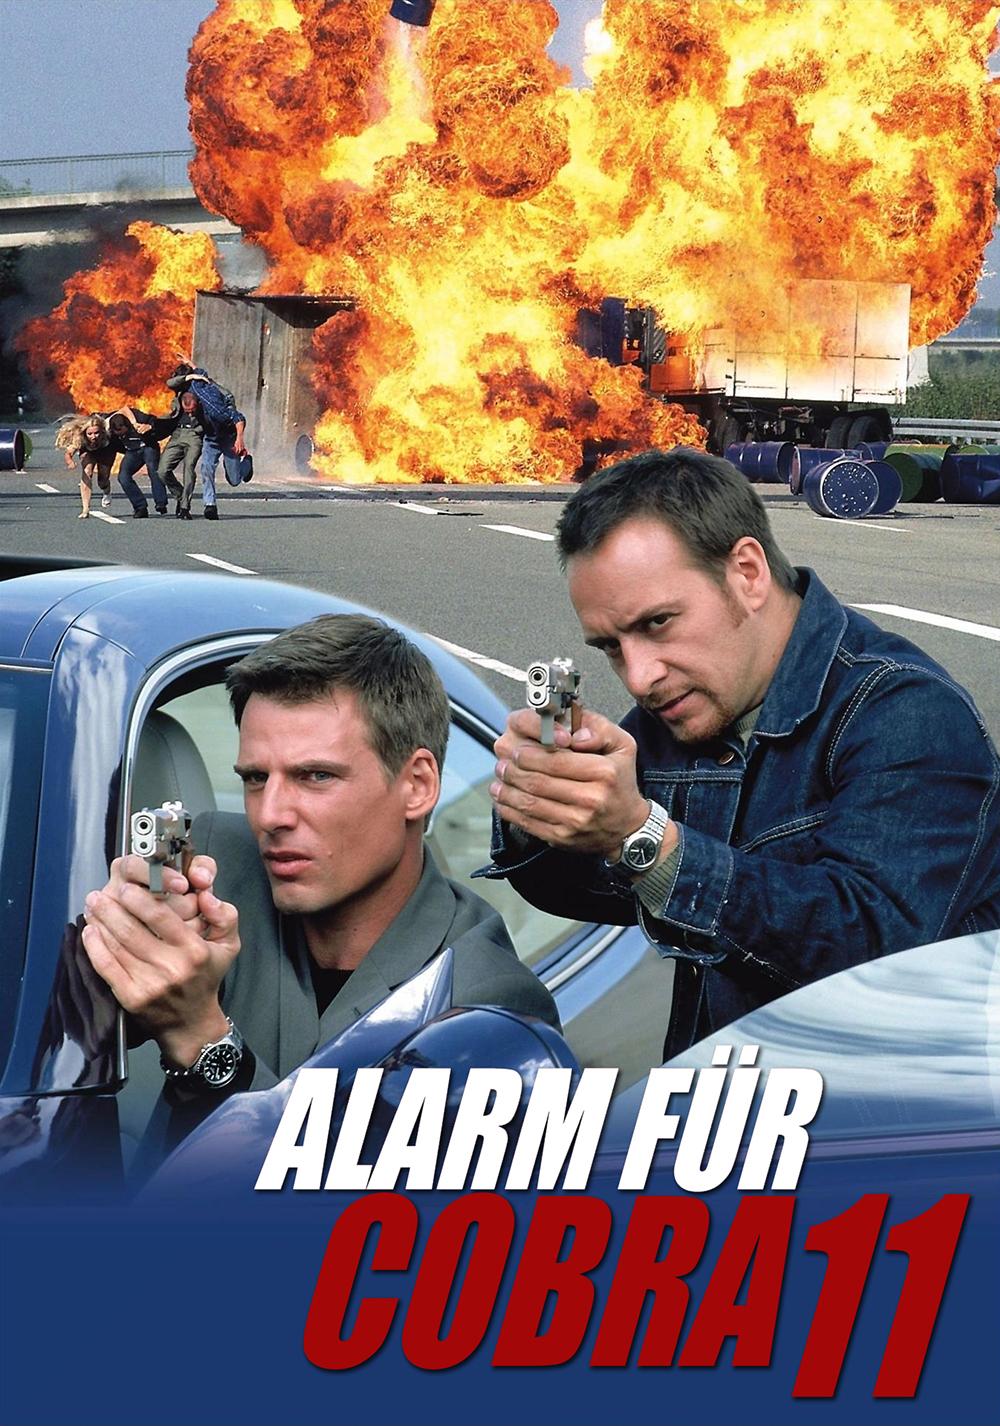 Florida Alarm Für Cobra 11